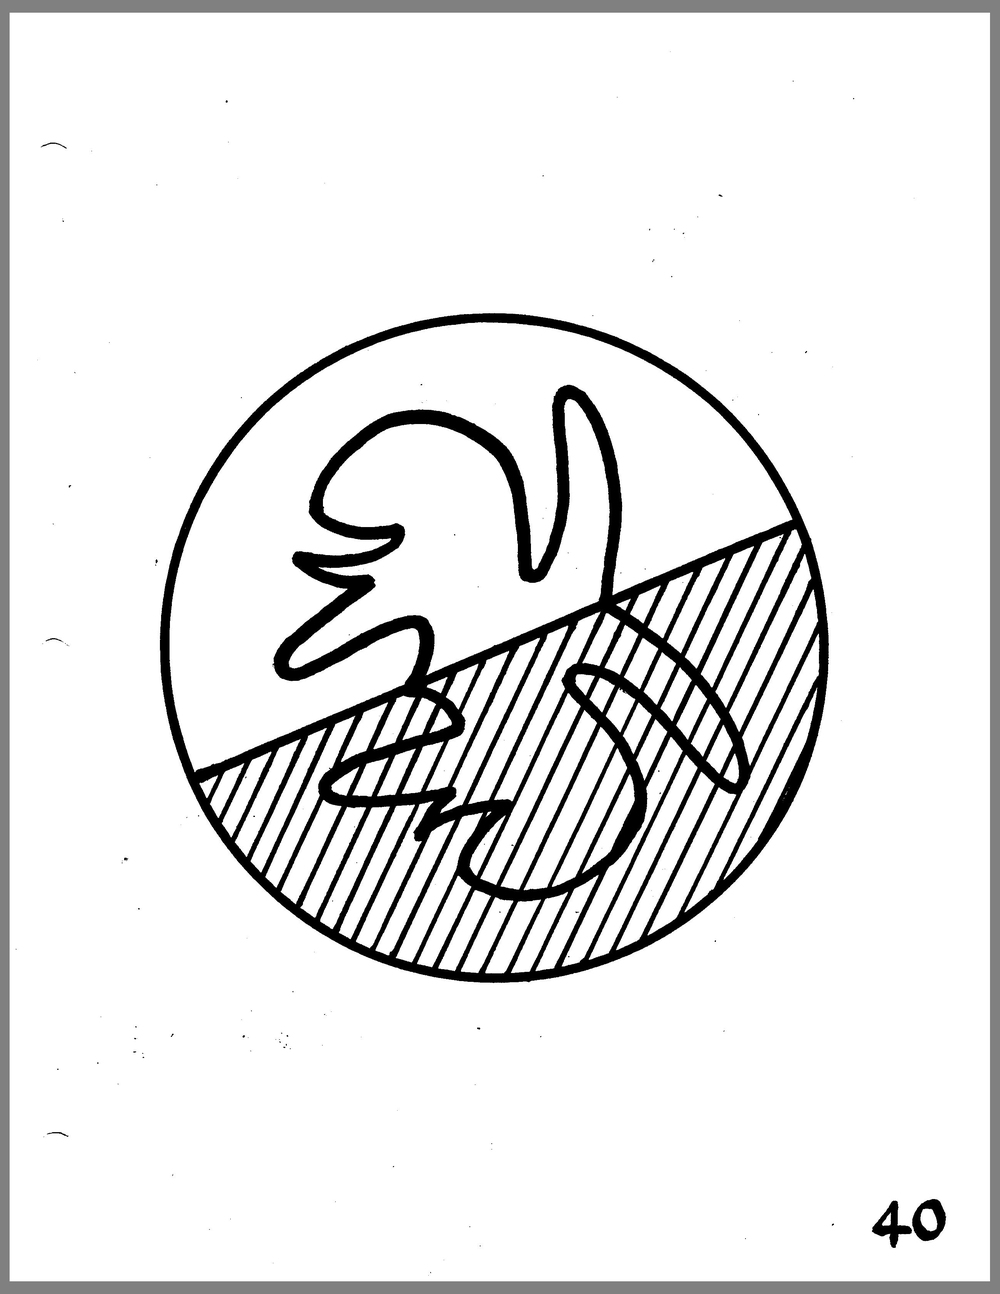 Diagram # 040 illustration